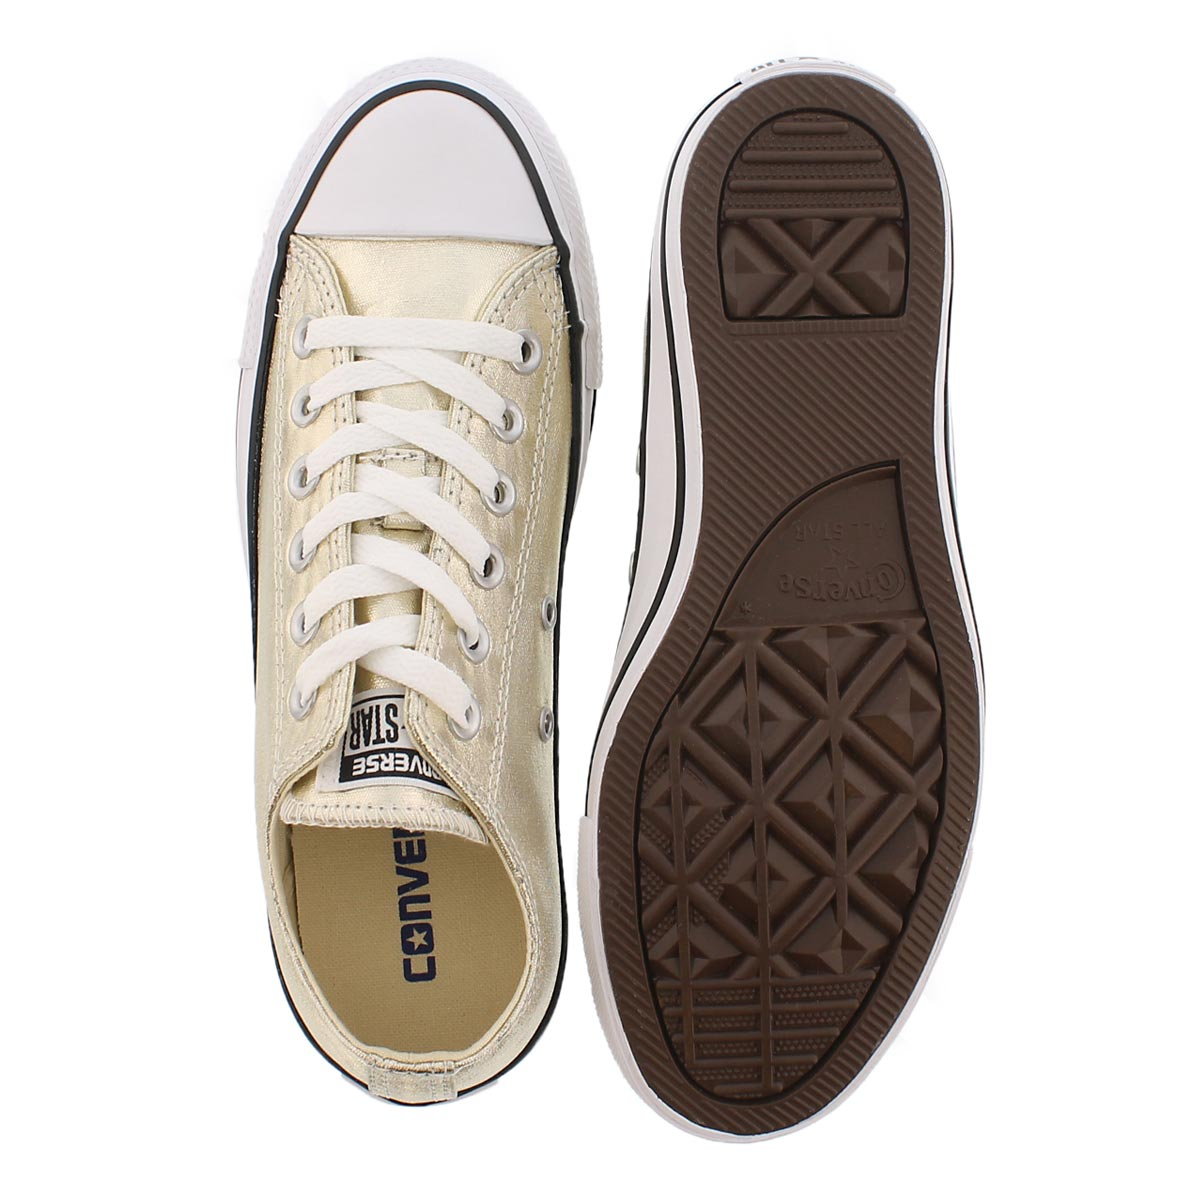 Lds CT A/S Seasonal Metallic gld sneaker